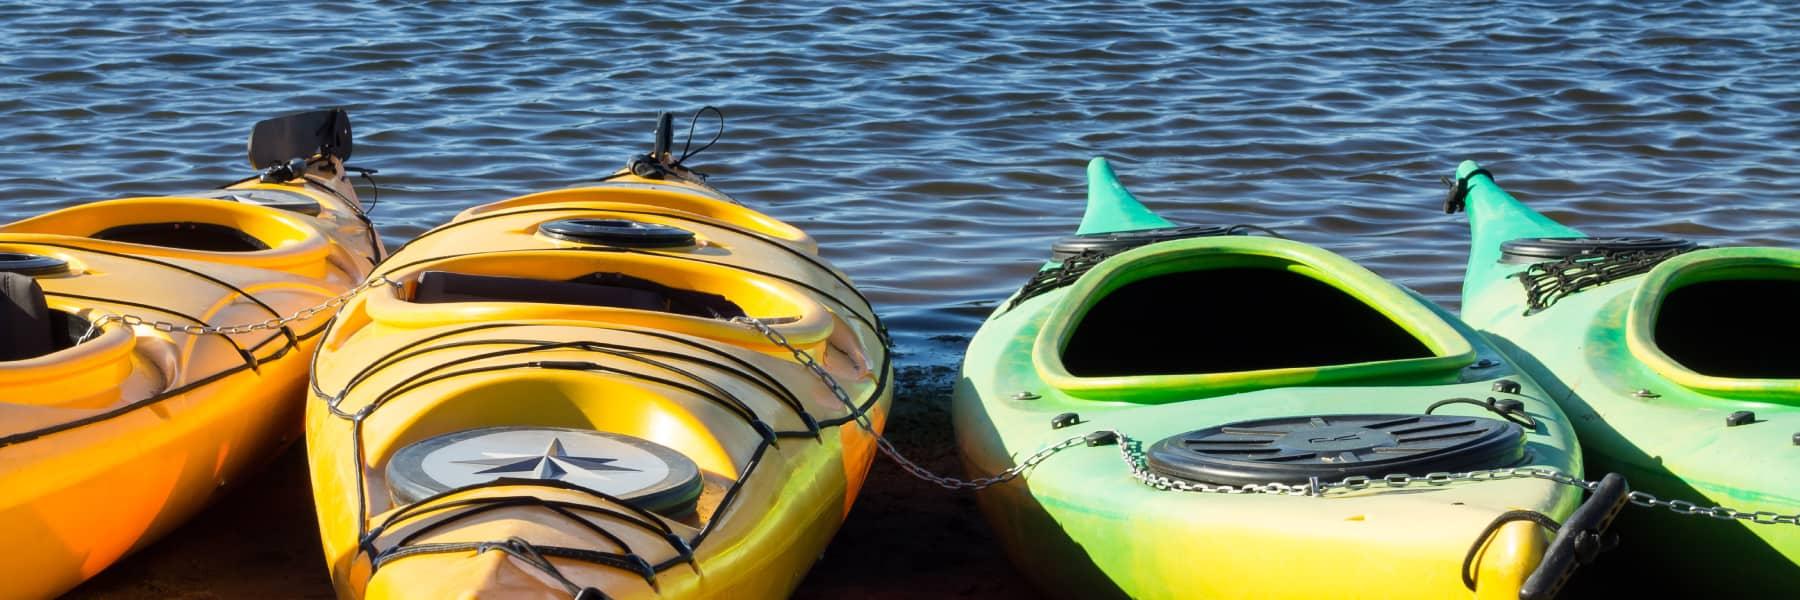 Suspenz Universal Kayak Locking System